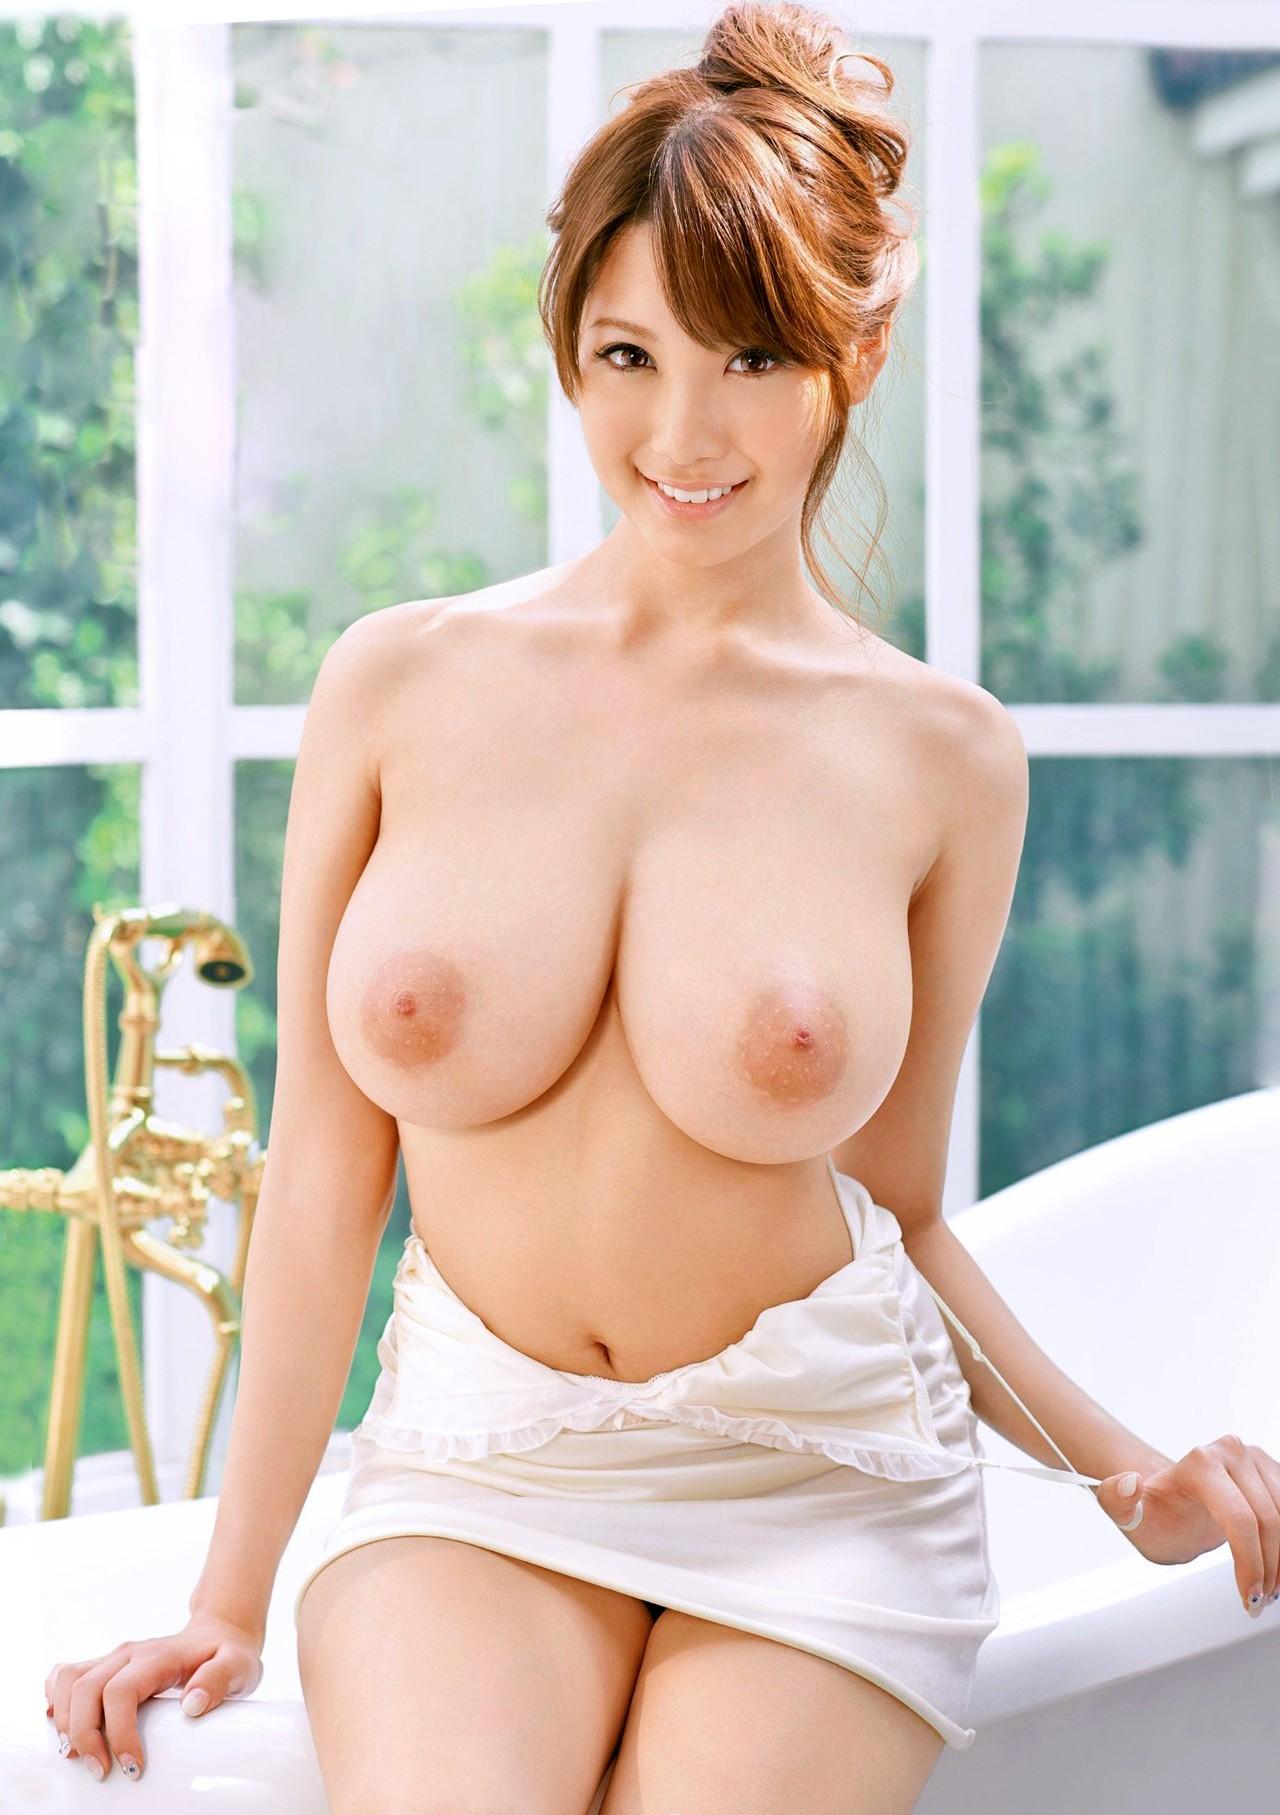 Really nice tits